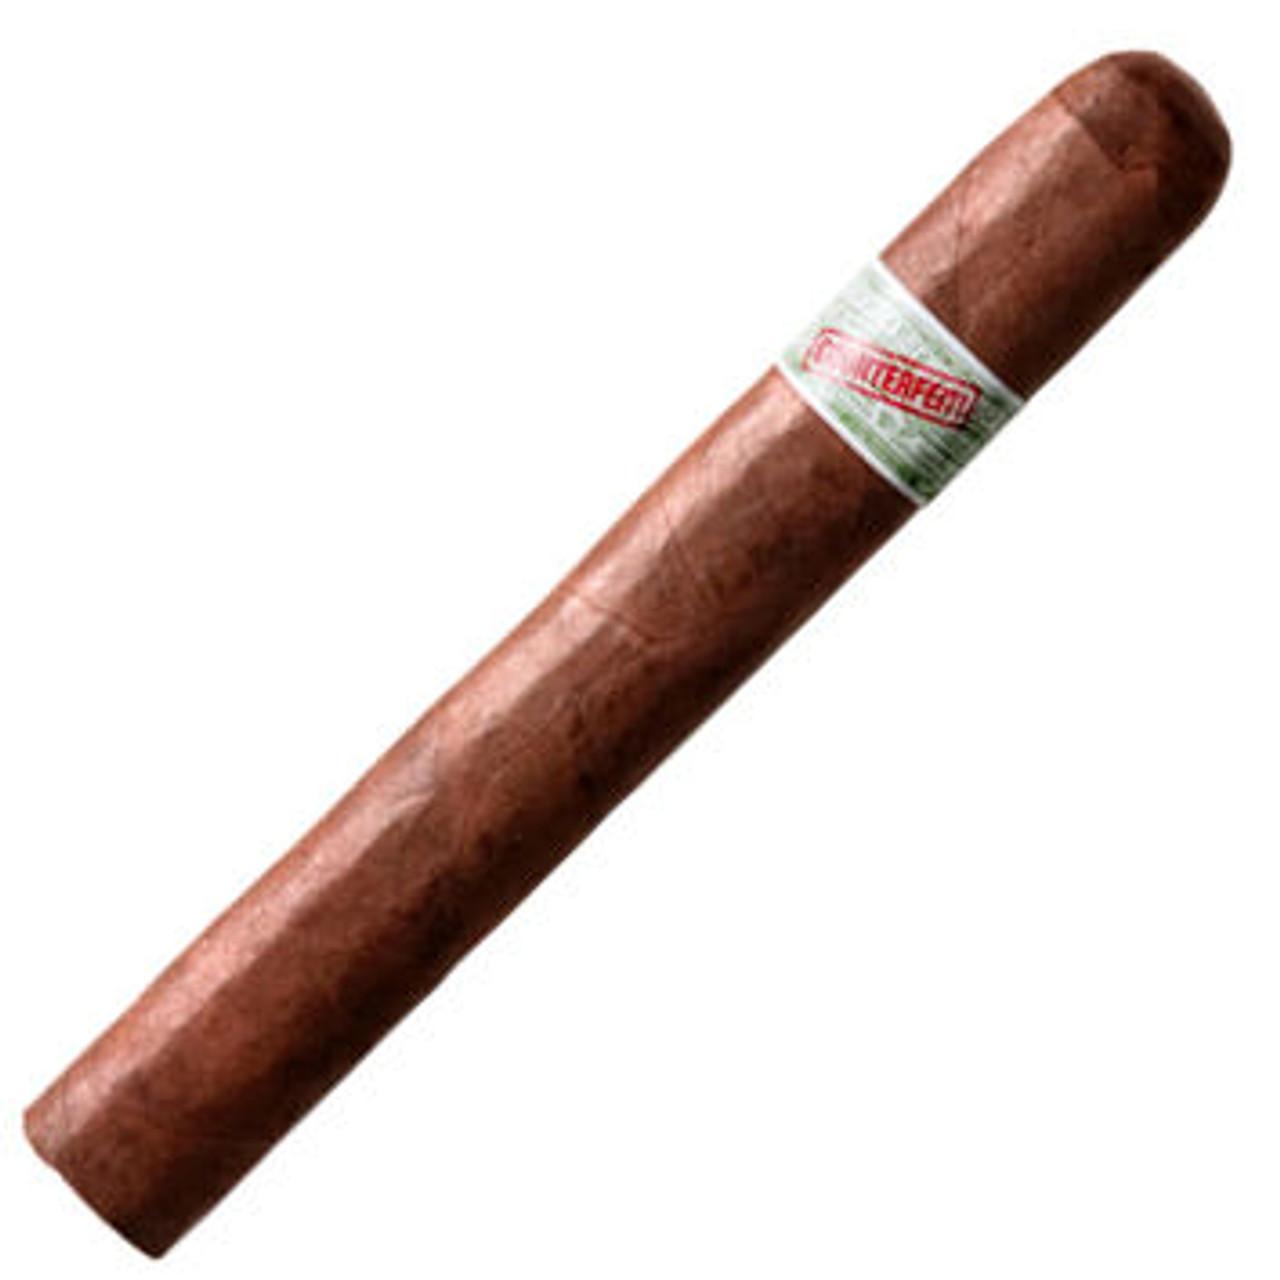 Genuine Counterfeit Cuban Toro Cigars - 6.0 x 50 (Box of 25)